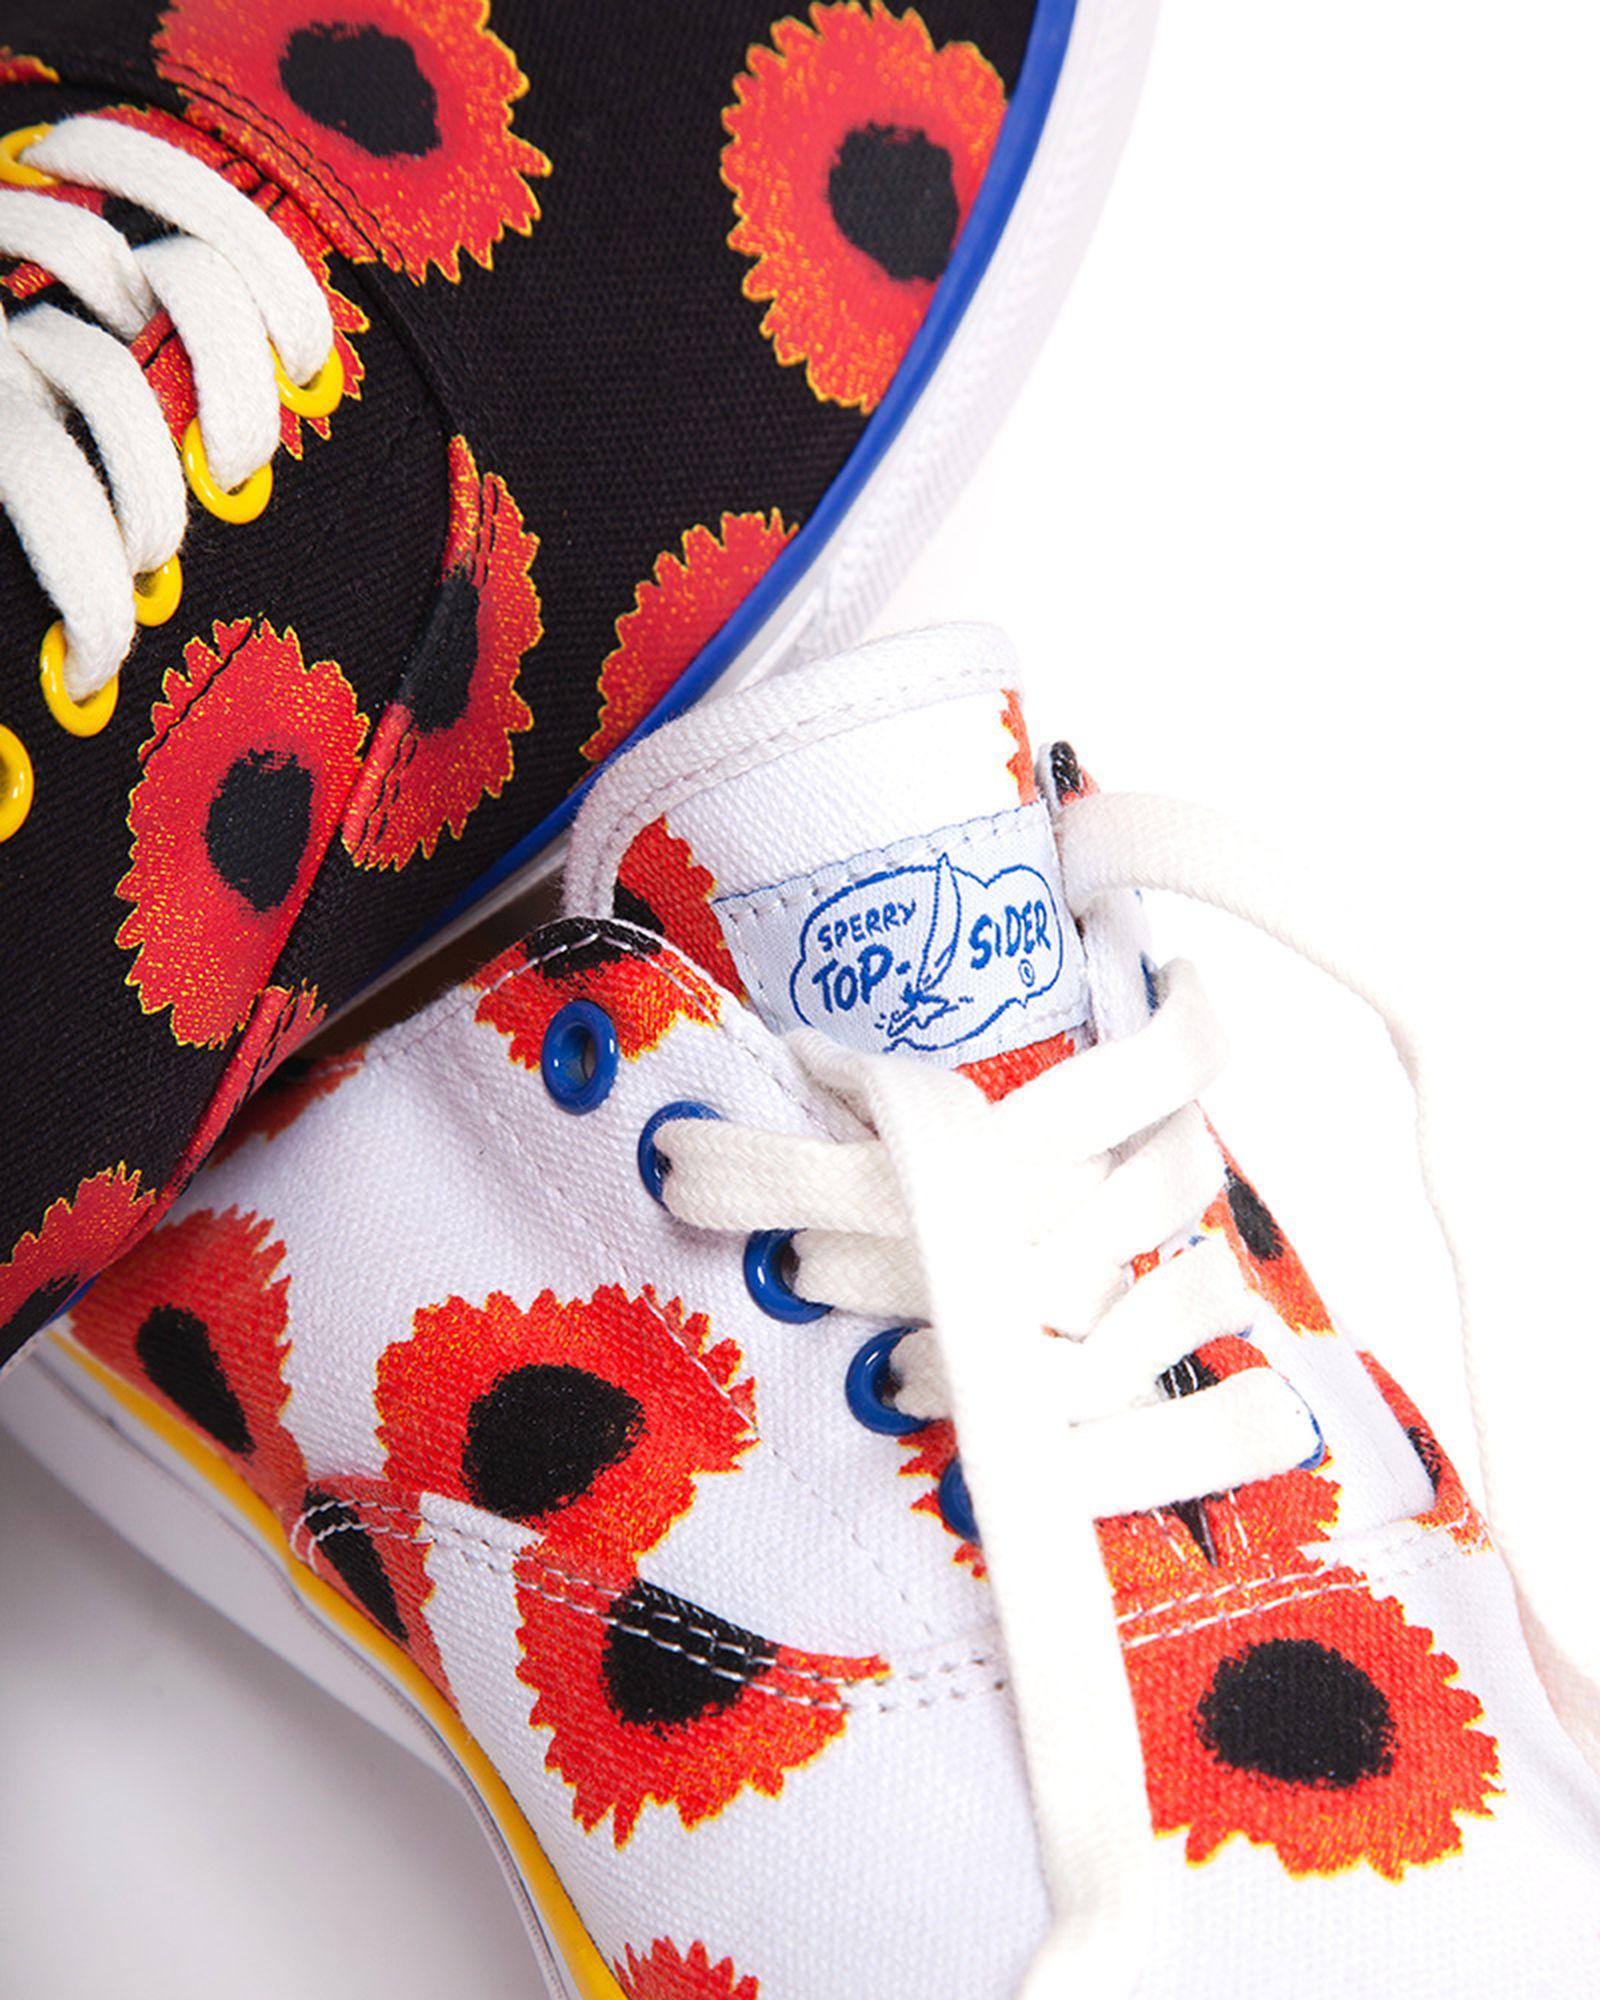 noah sperry cloud cvo floral release date price